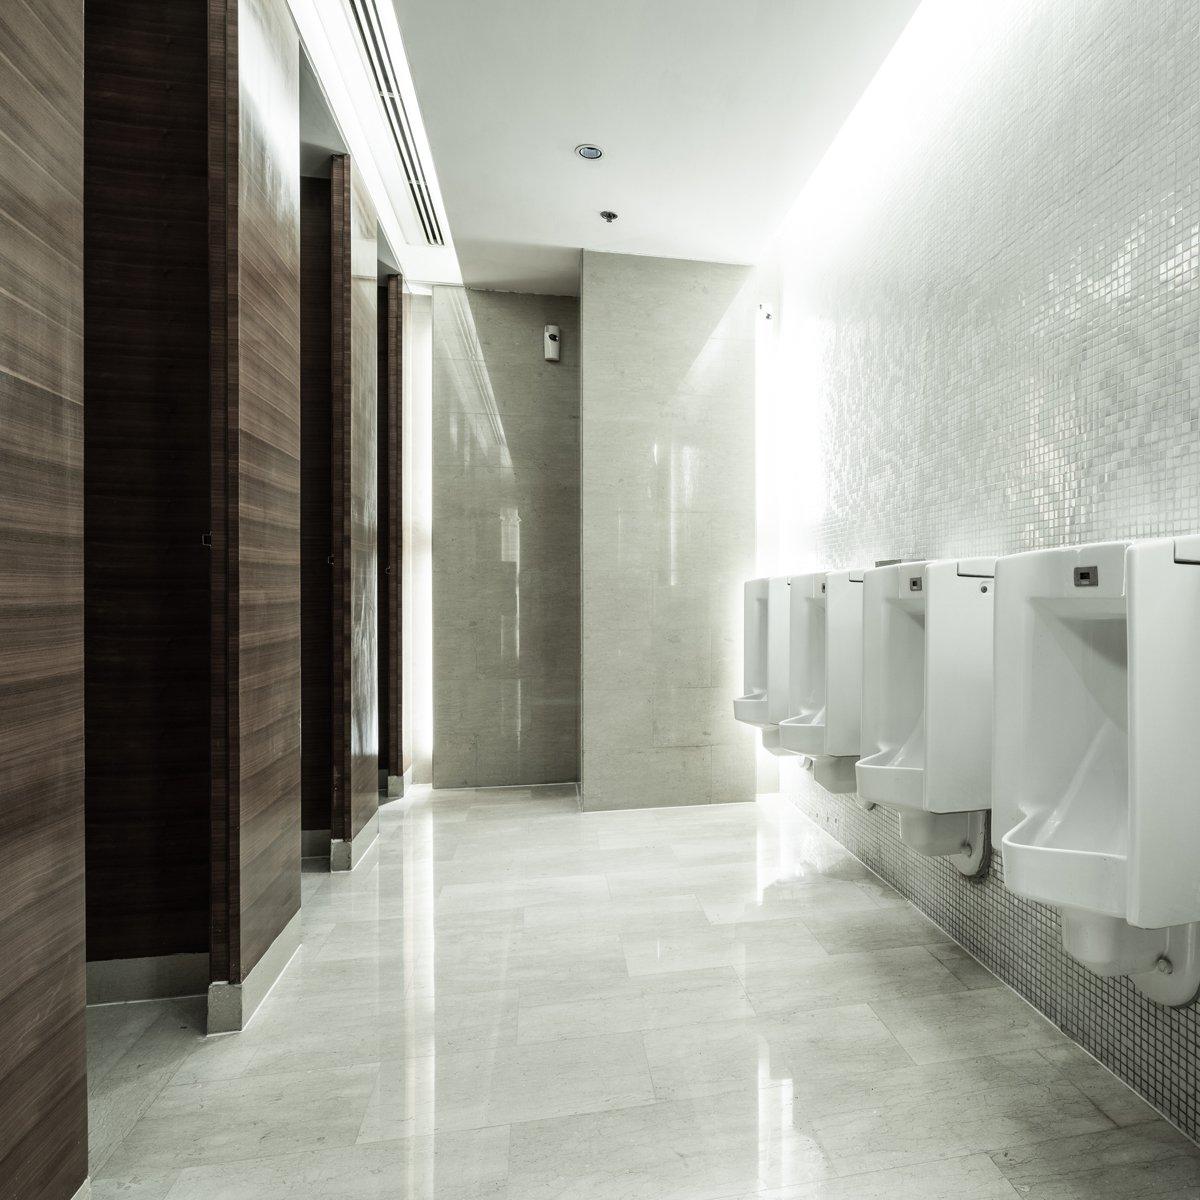 Bathroom Remodeling Services 2